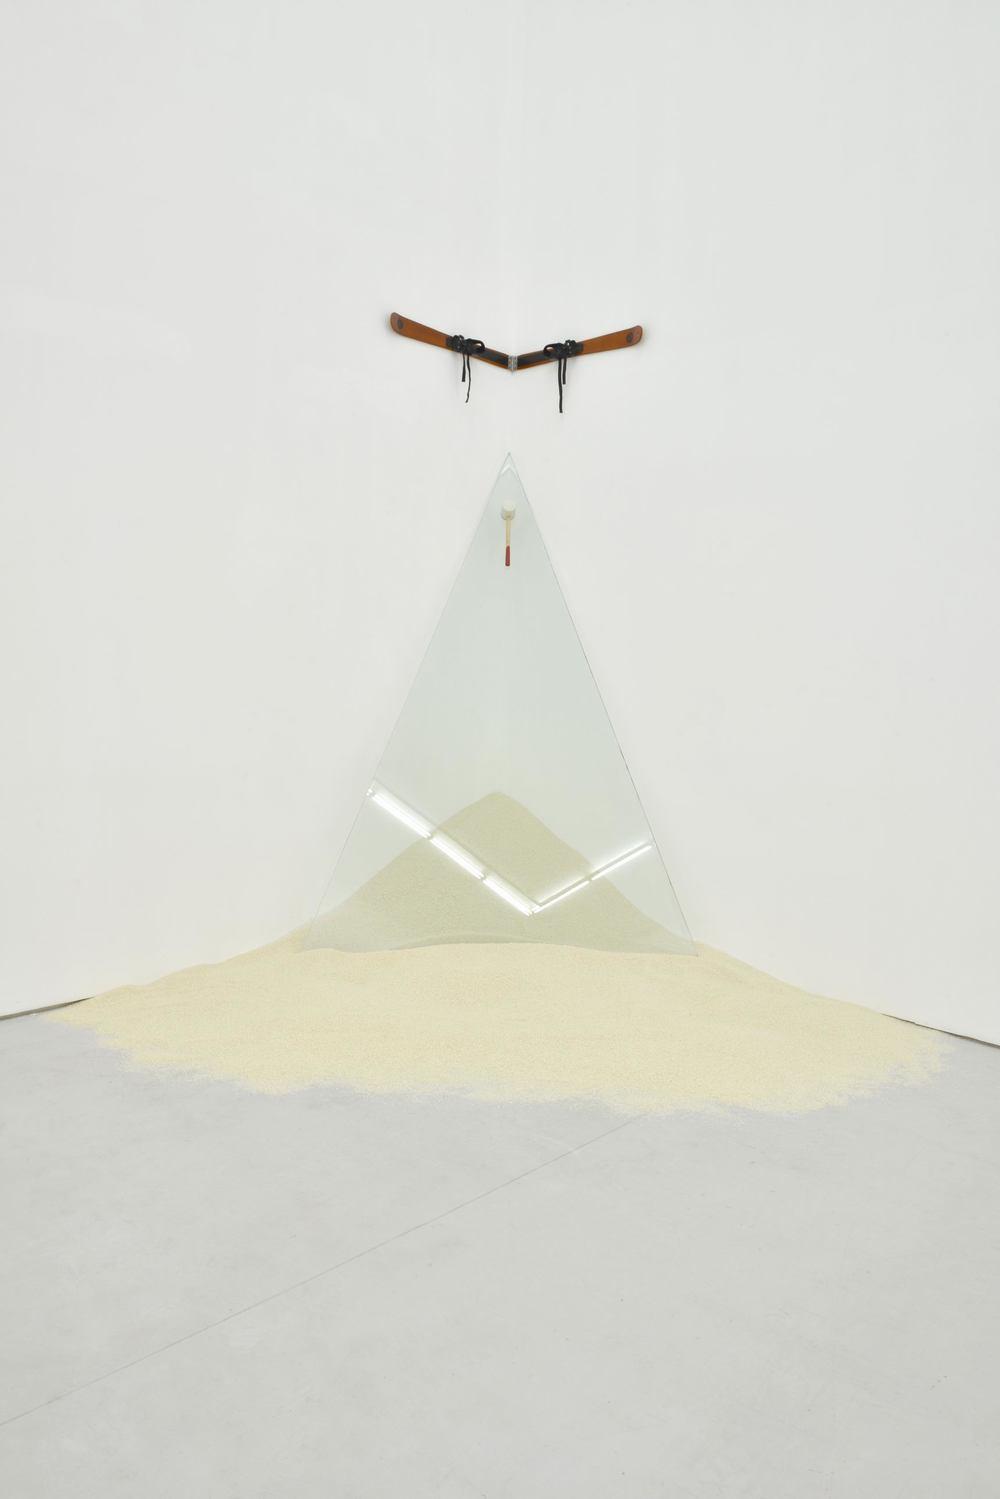 Gao Lei 高磊, W-005, 2013, Rice glass ski hinge and rubber hammer 大米、玻璃、雪橇、合页、橡皮锤